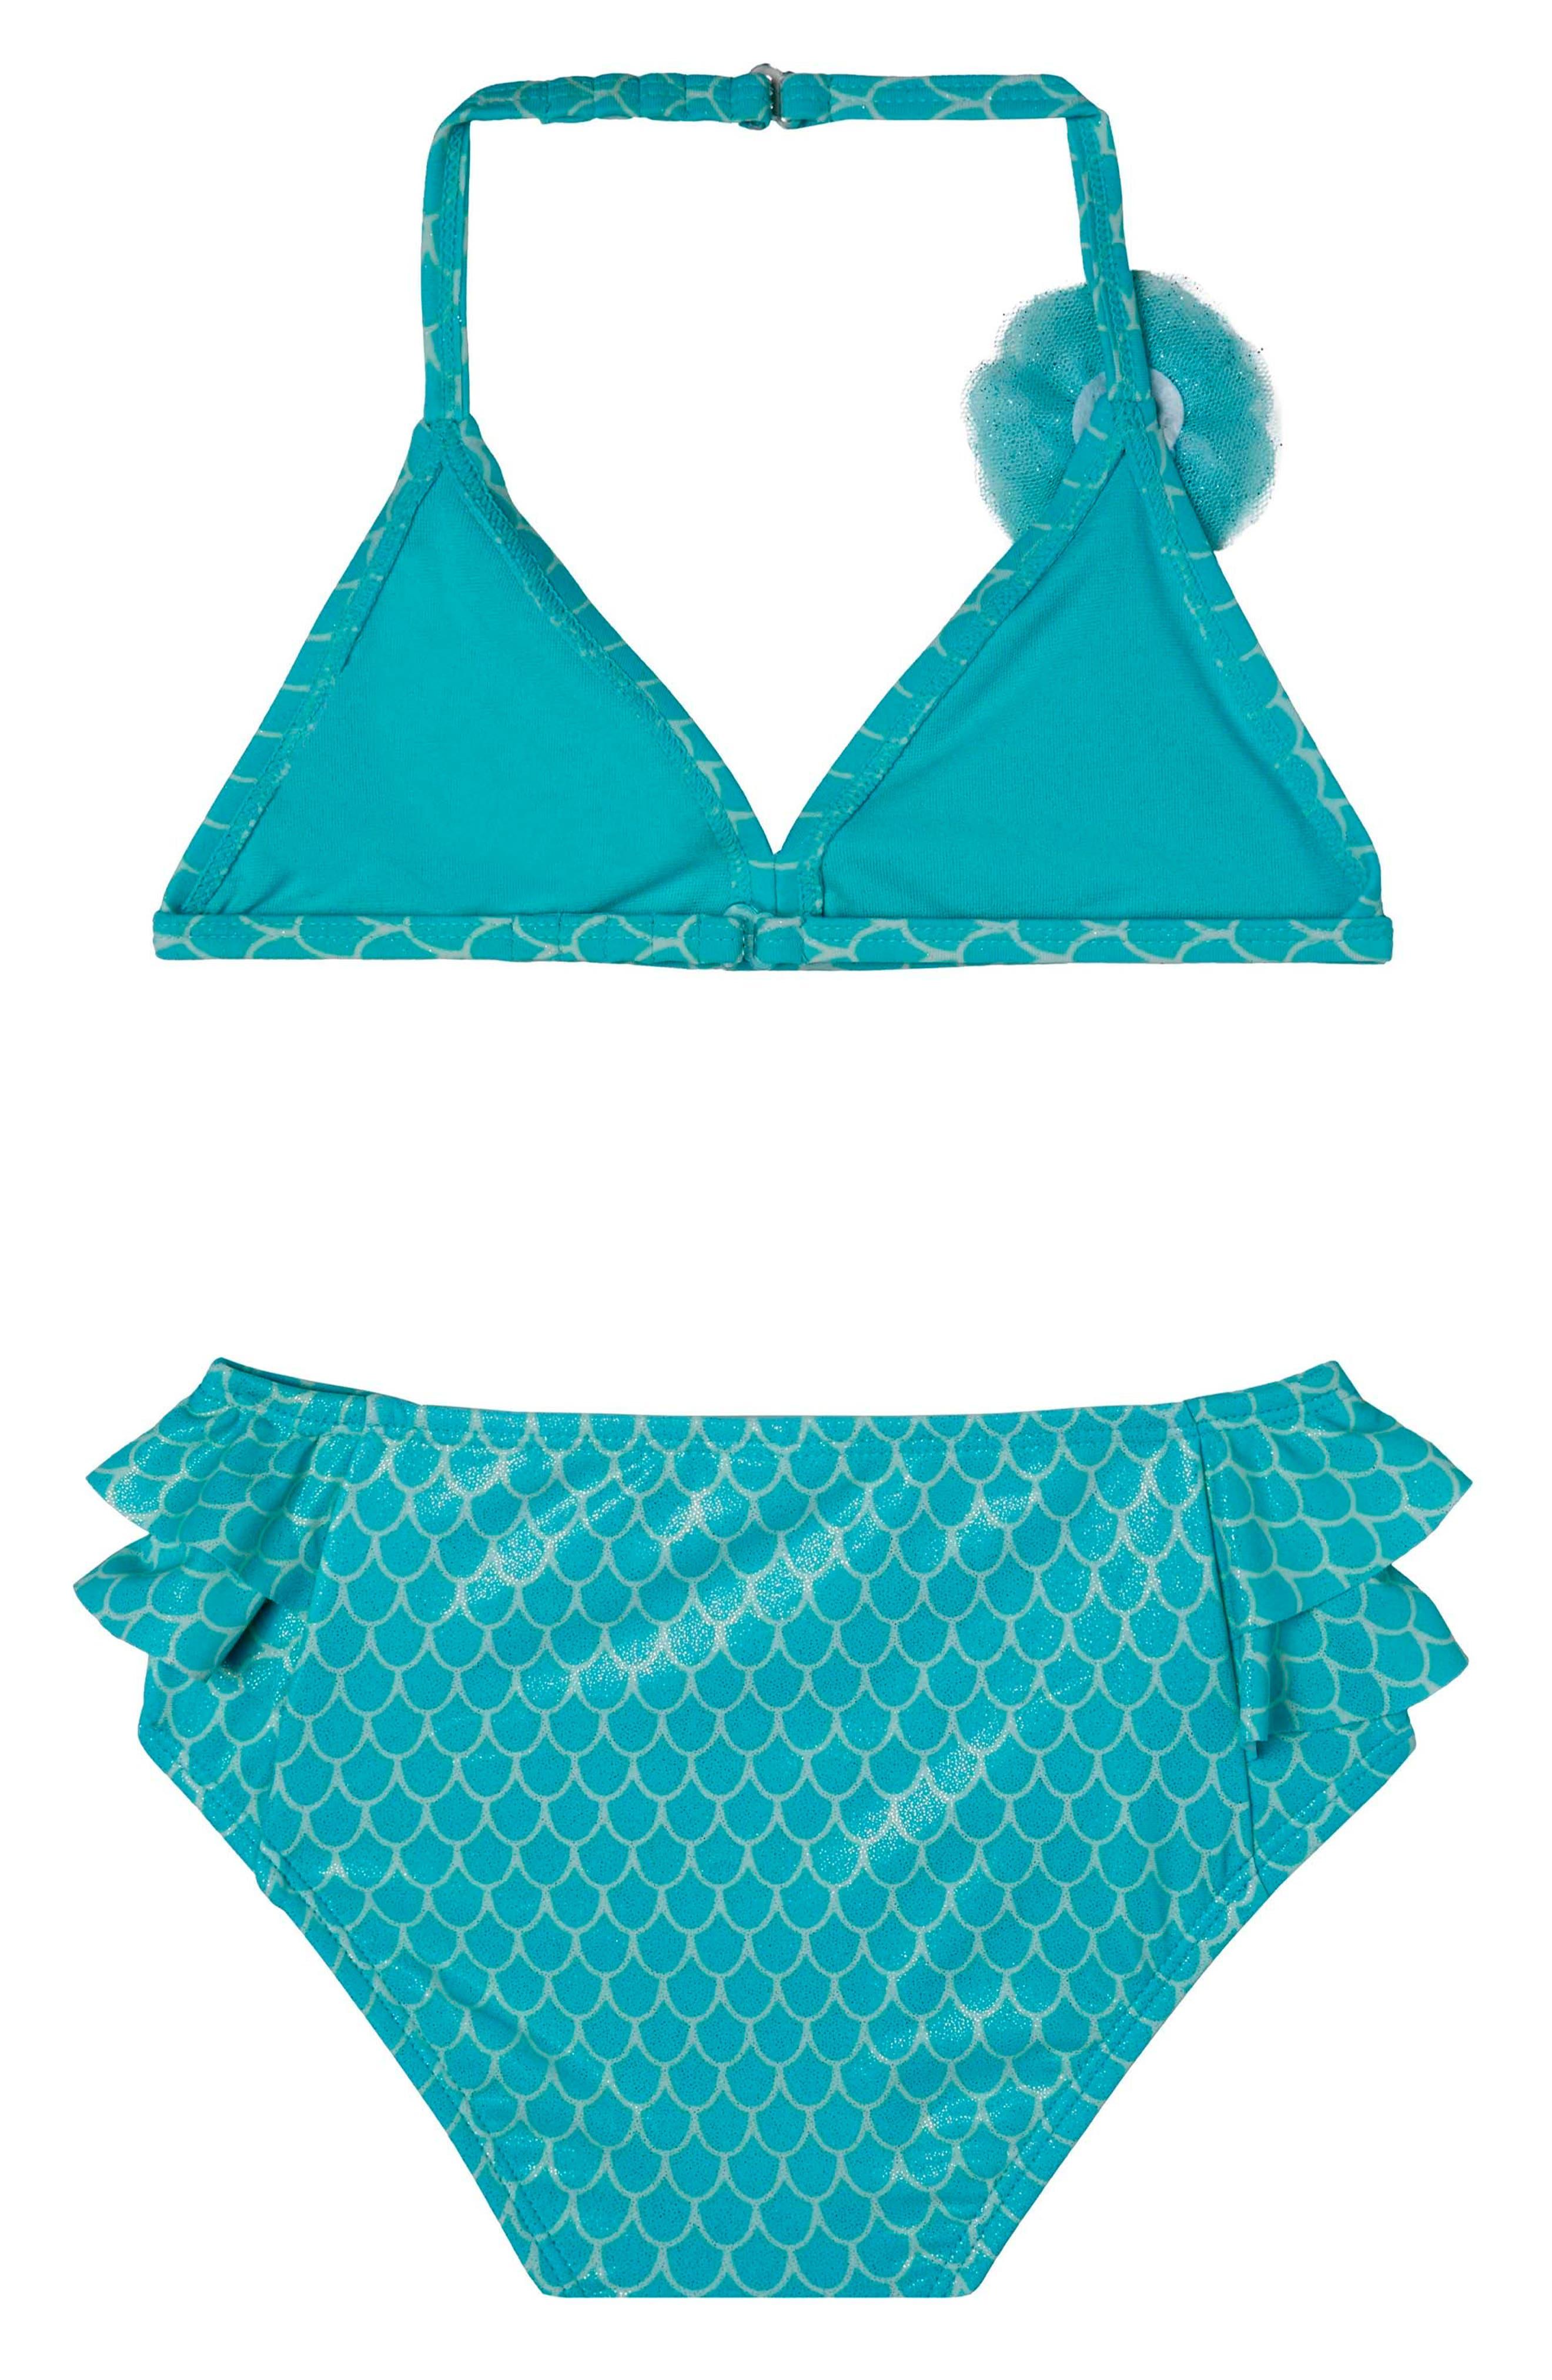 Mermaid Princess Two-Piece Swimsuit,                             Alternate thumbnail 2, color,                             Aqua